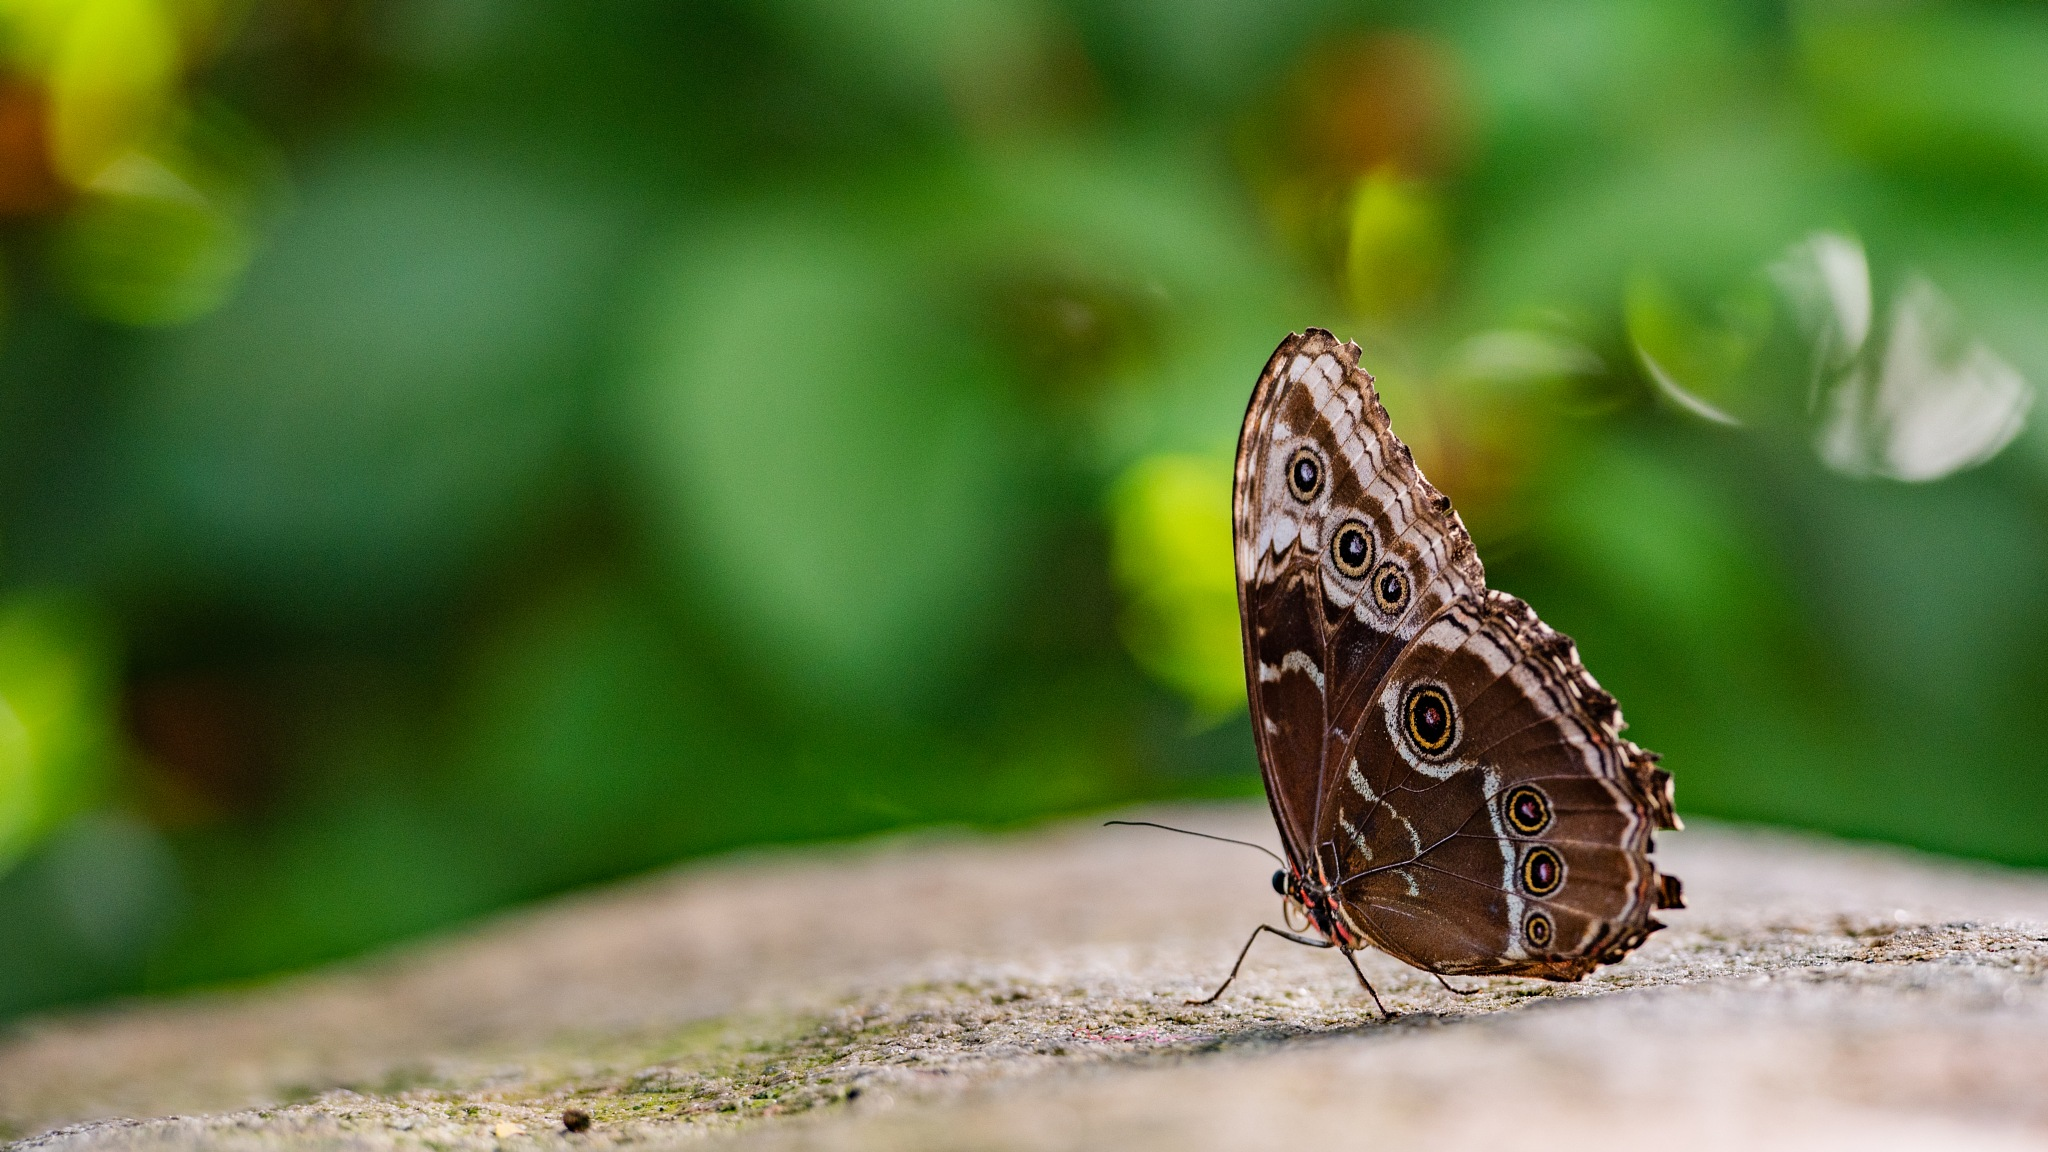 Butterfly 01 by LancePangborn